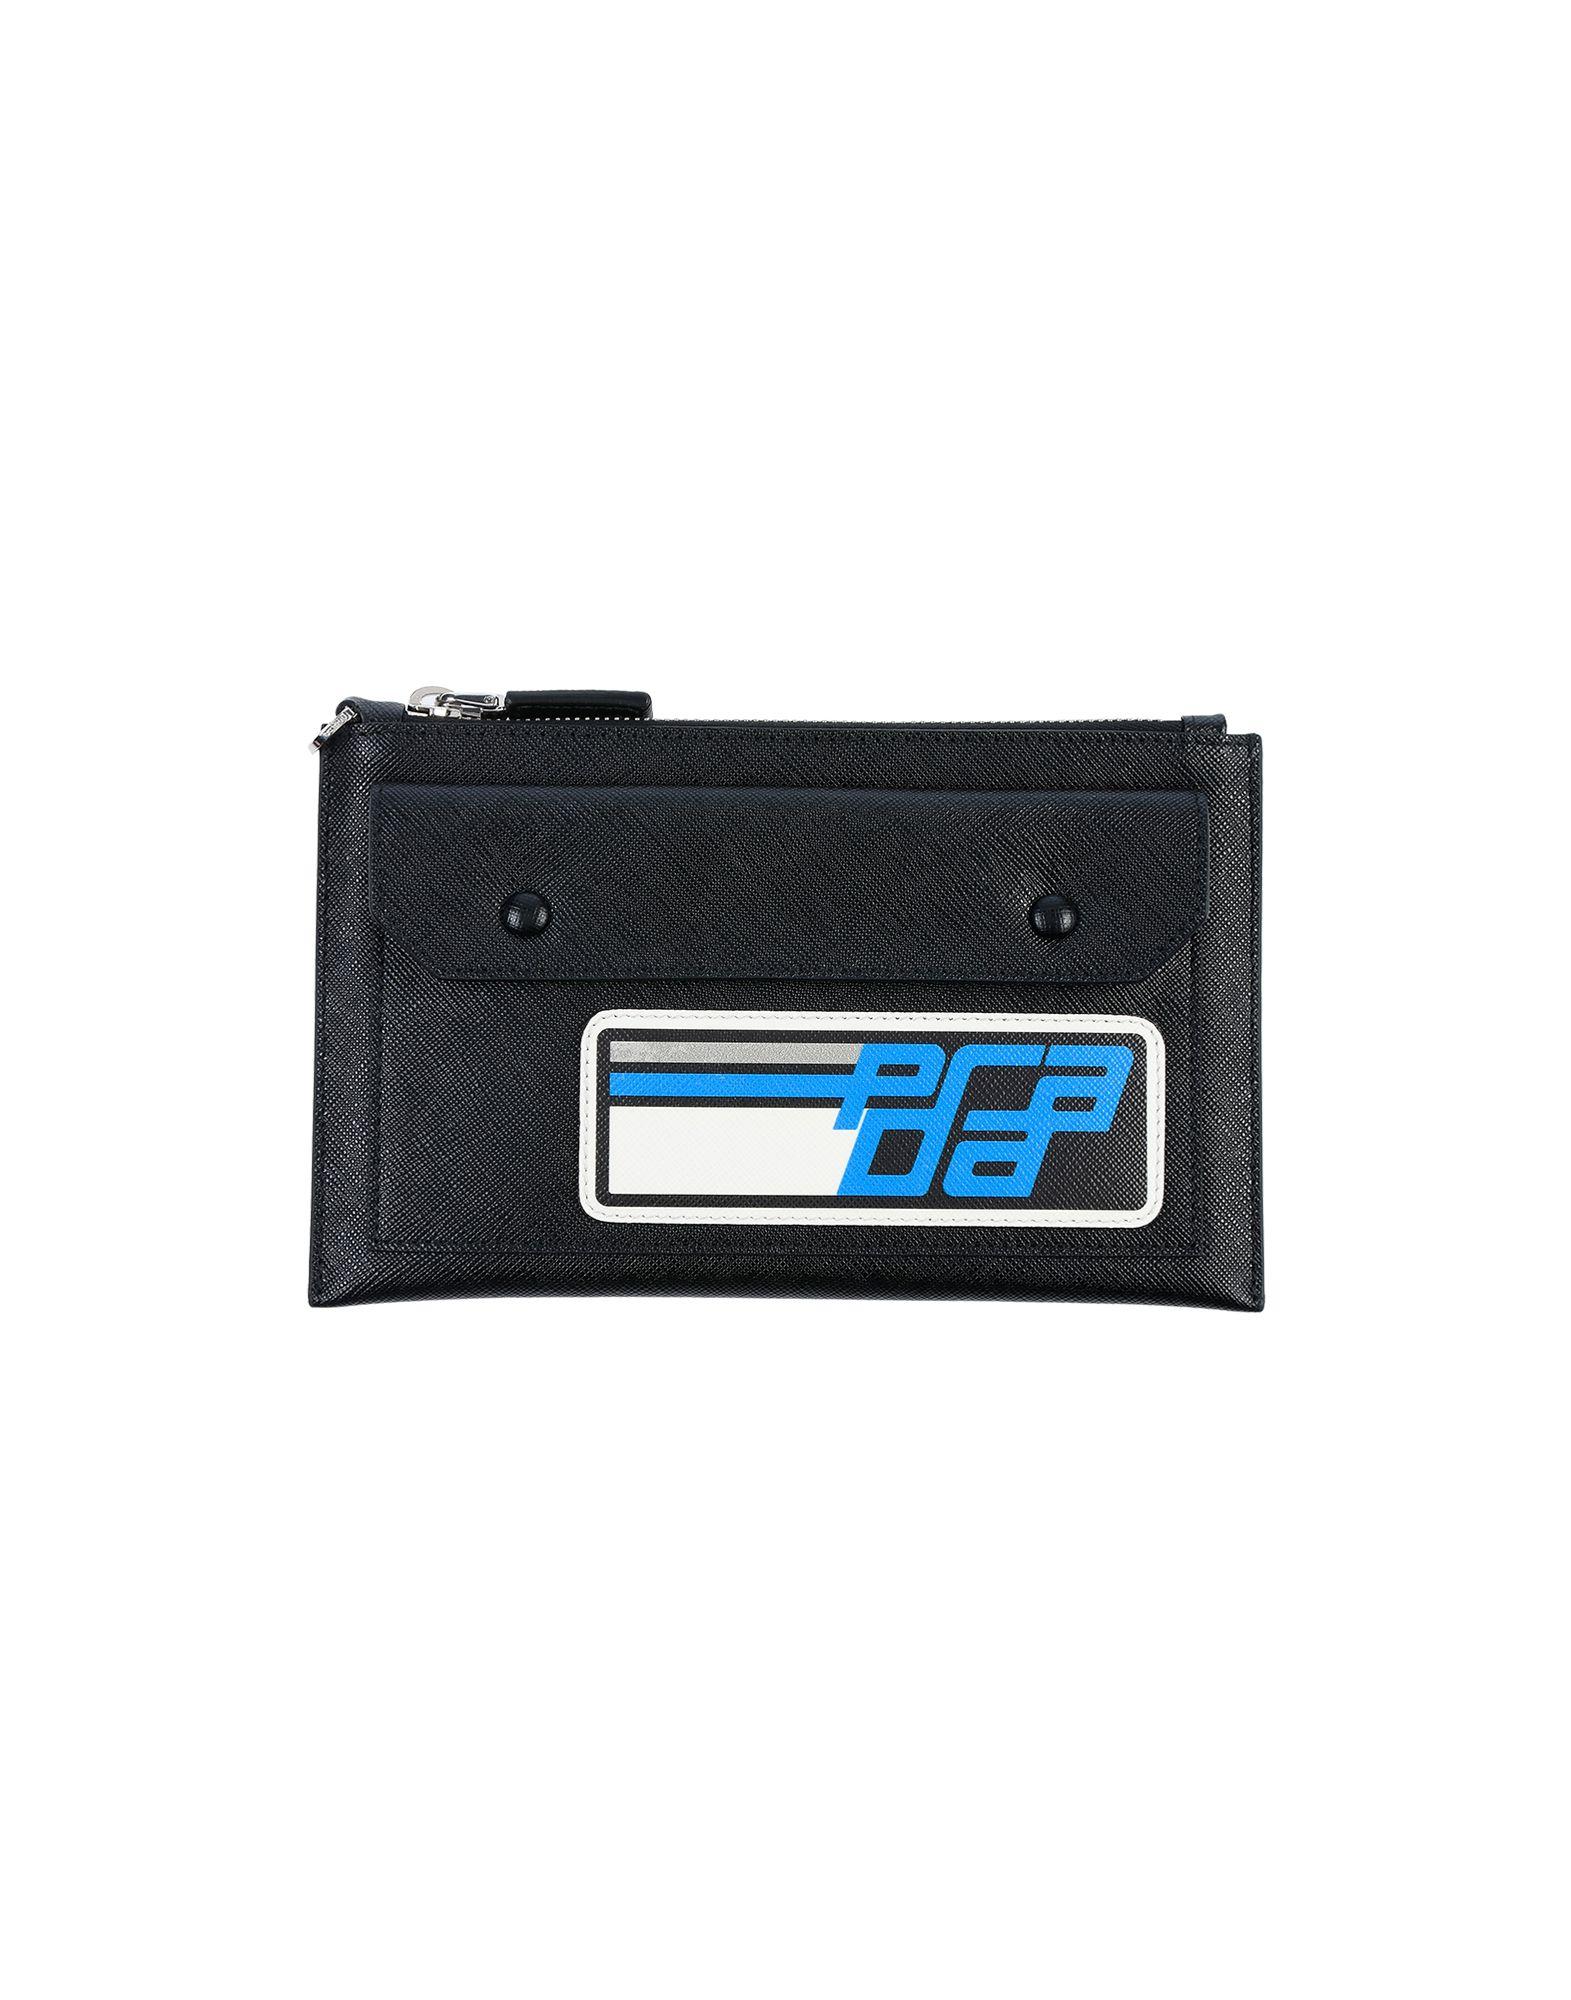 35f4cf900dd3 プラダ(PRADA) セカンドバッグ | 通販・人気ランキング - 価格.com